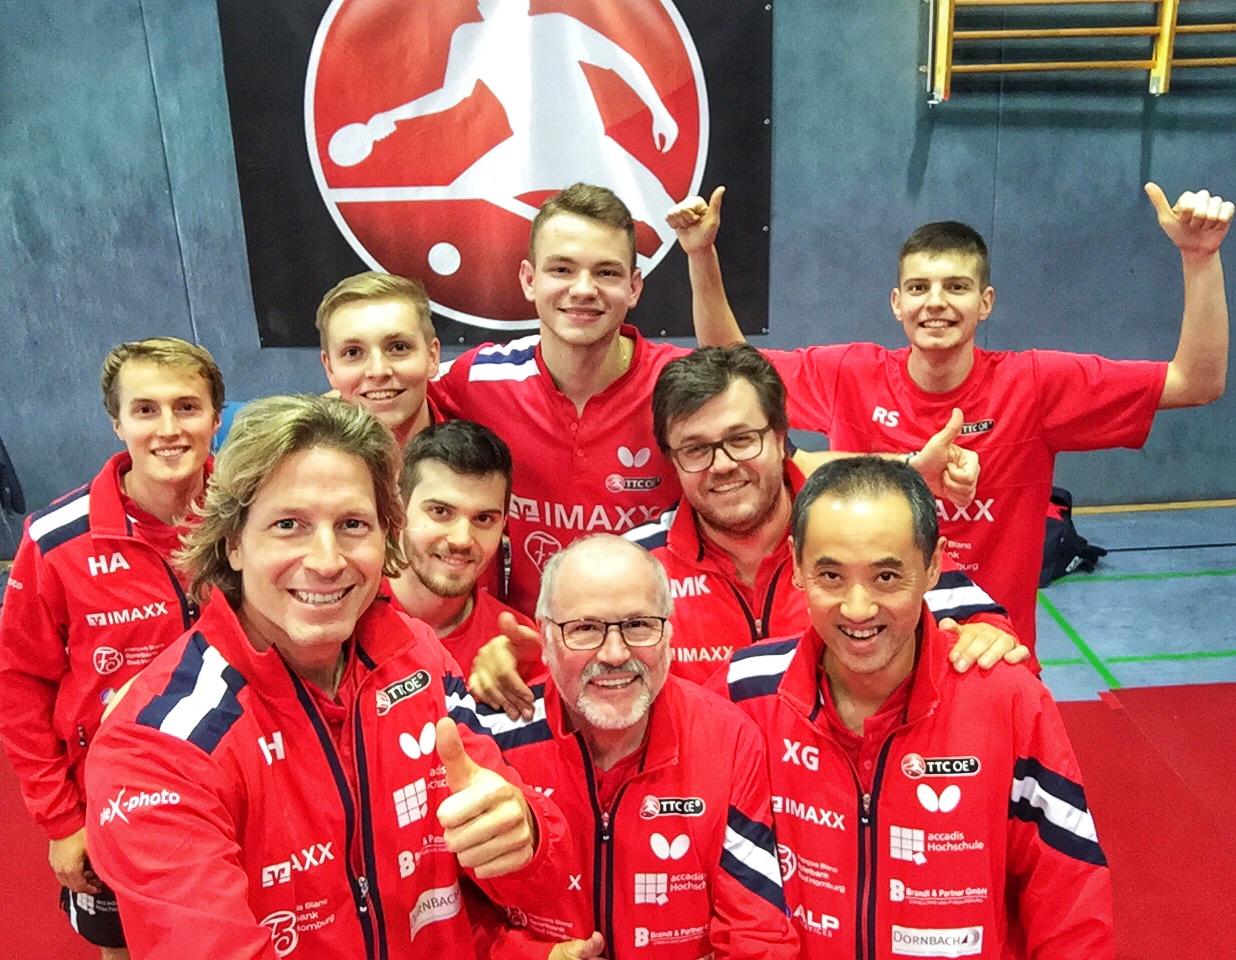 images/Erfolg gegen Passau - Team TTC OE.jpg